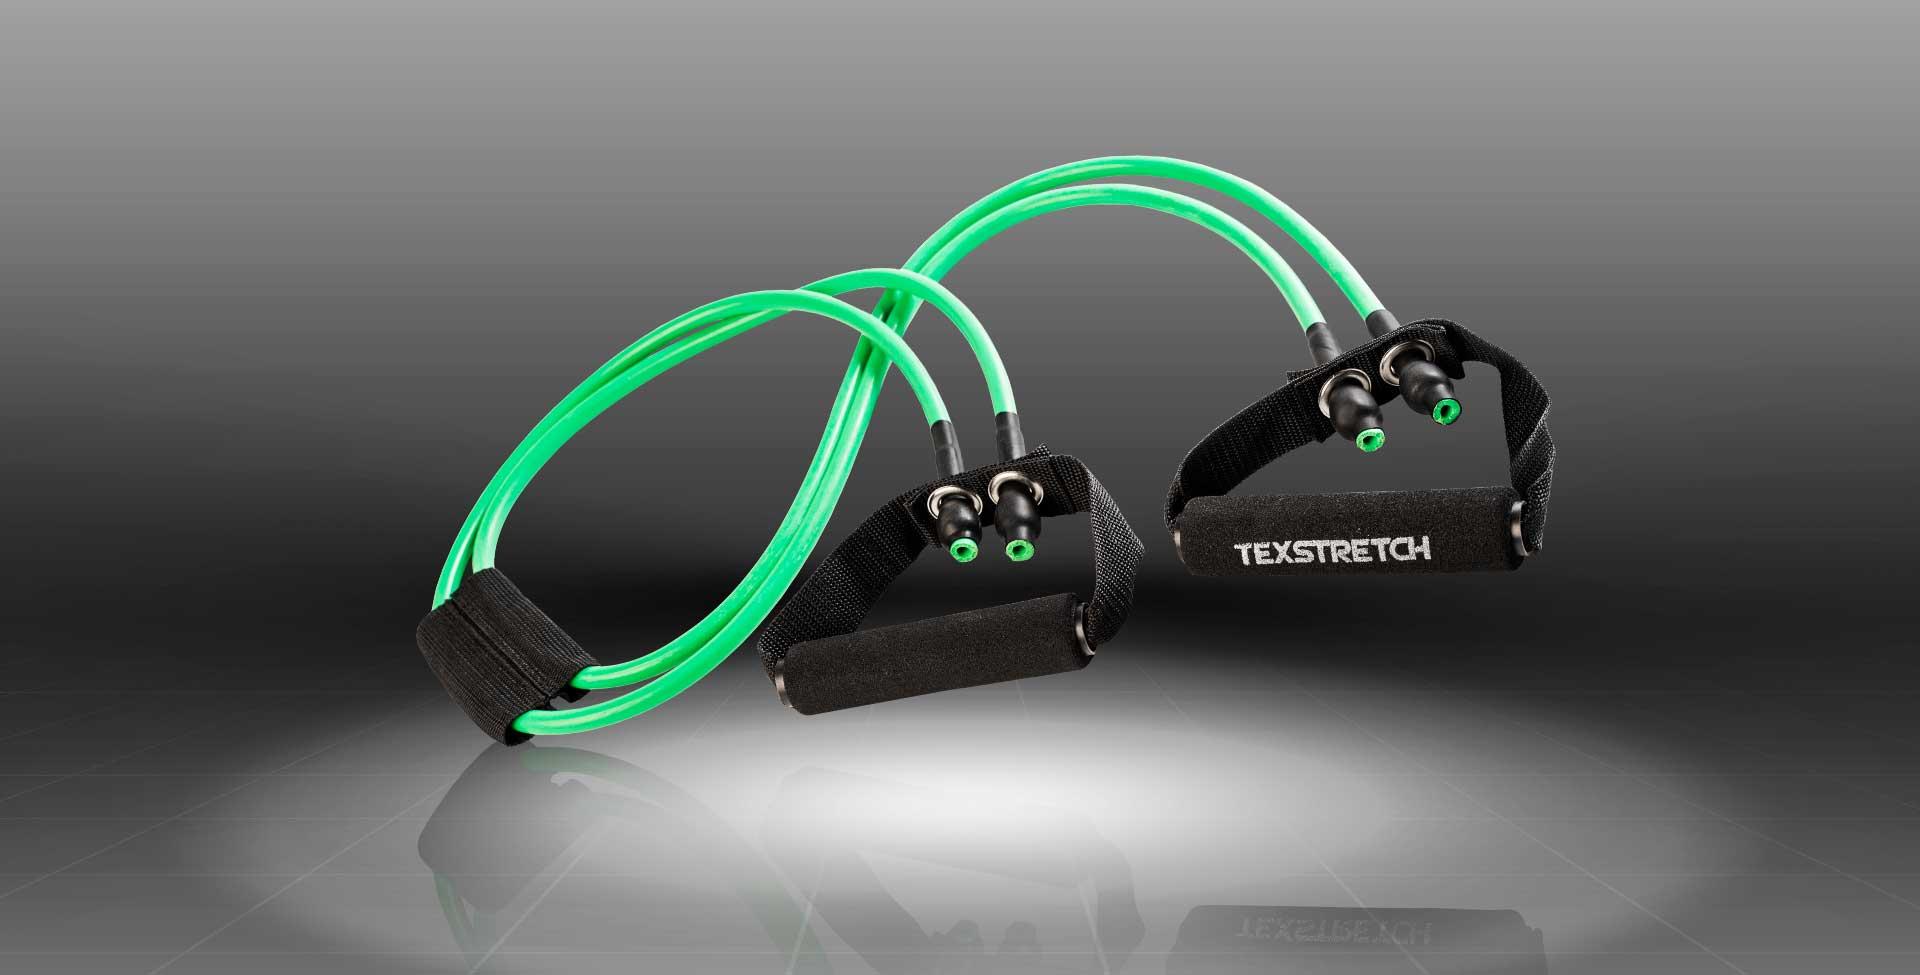 Texstretch Neon Super